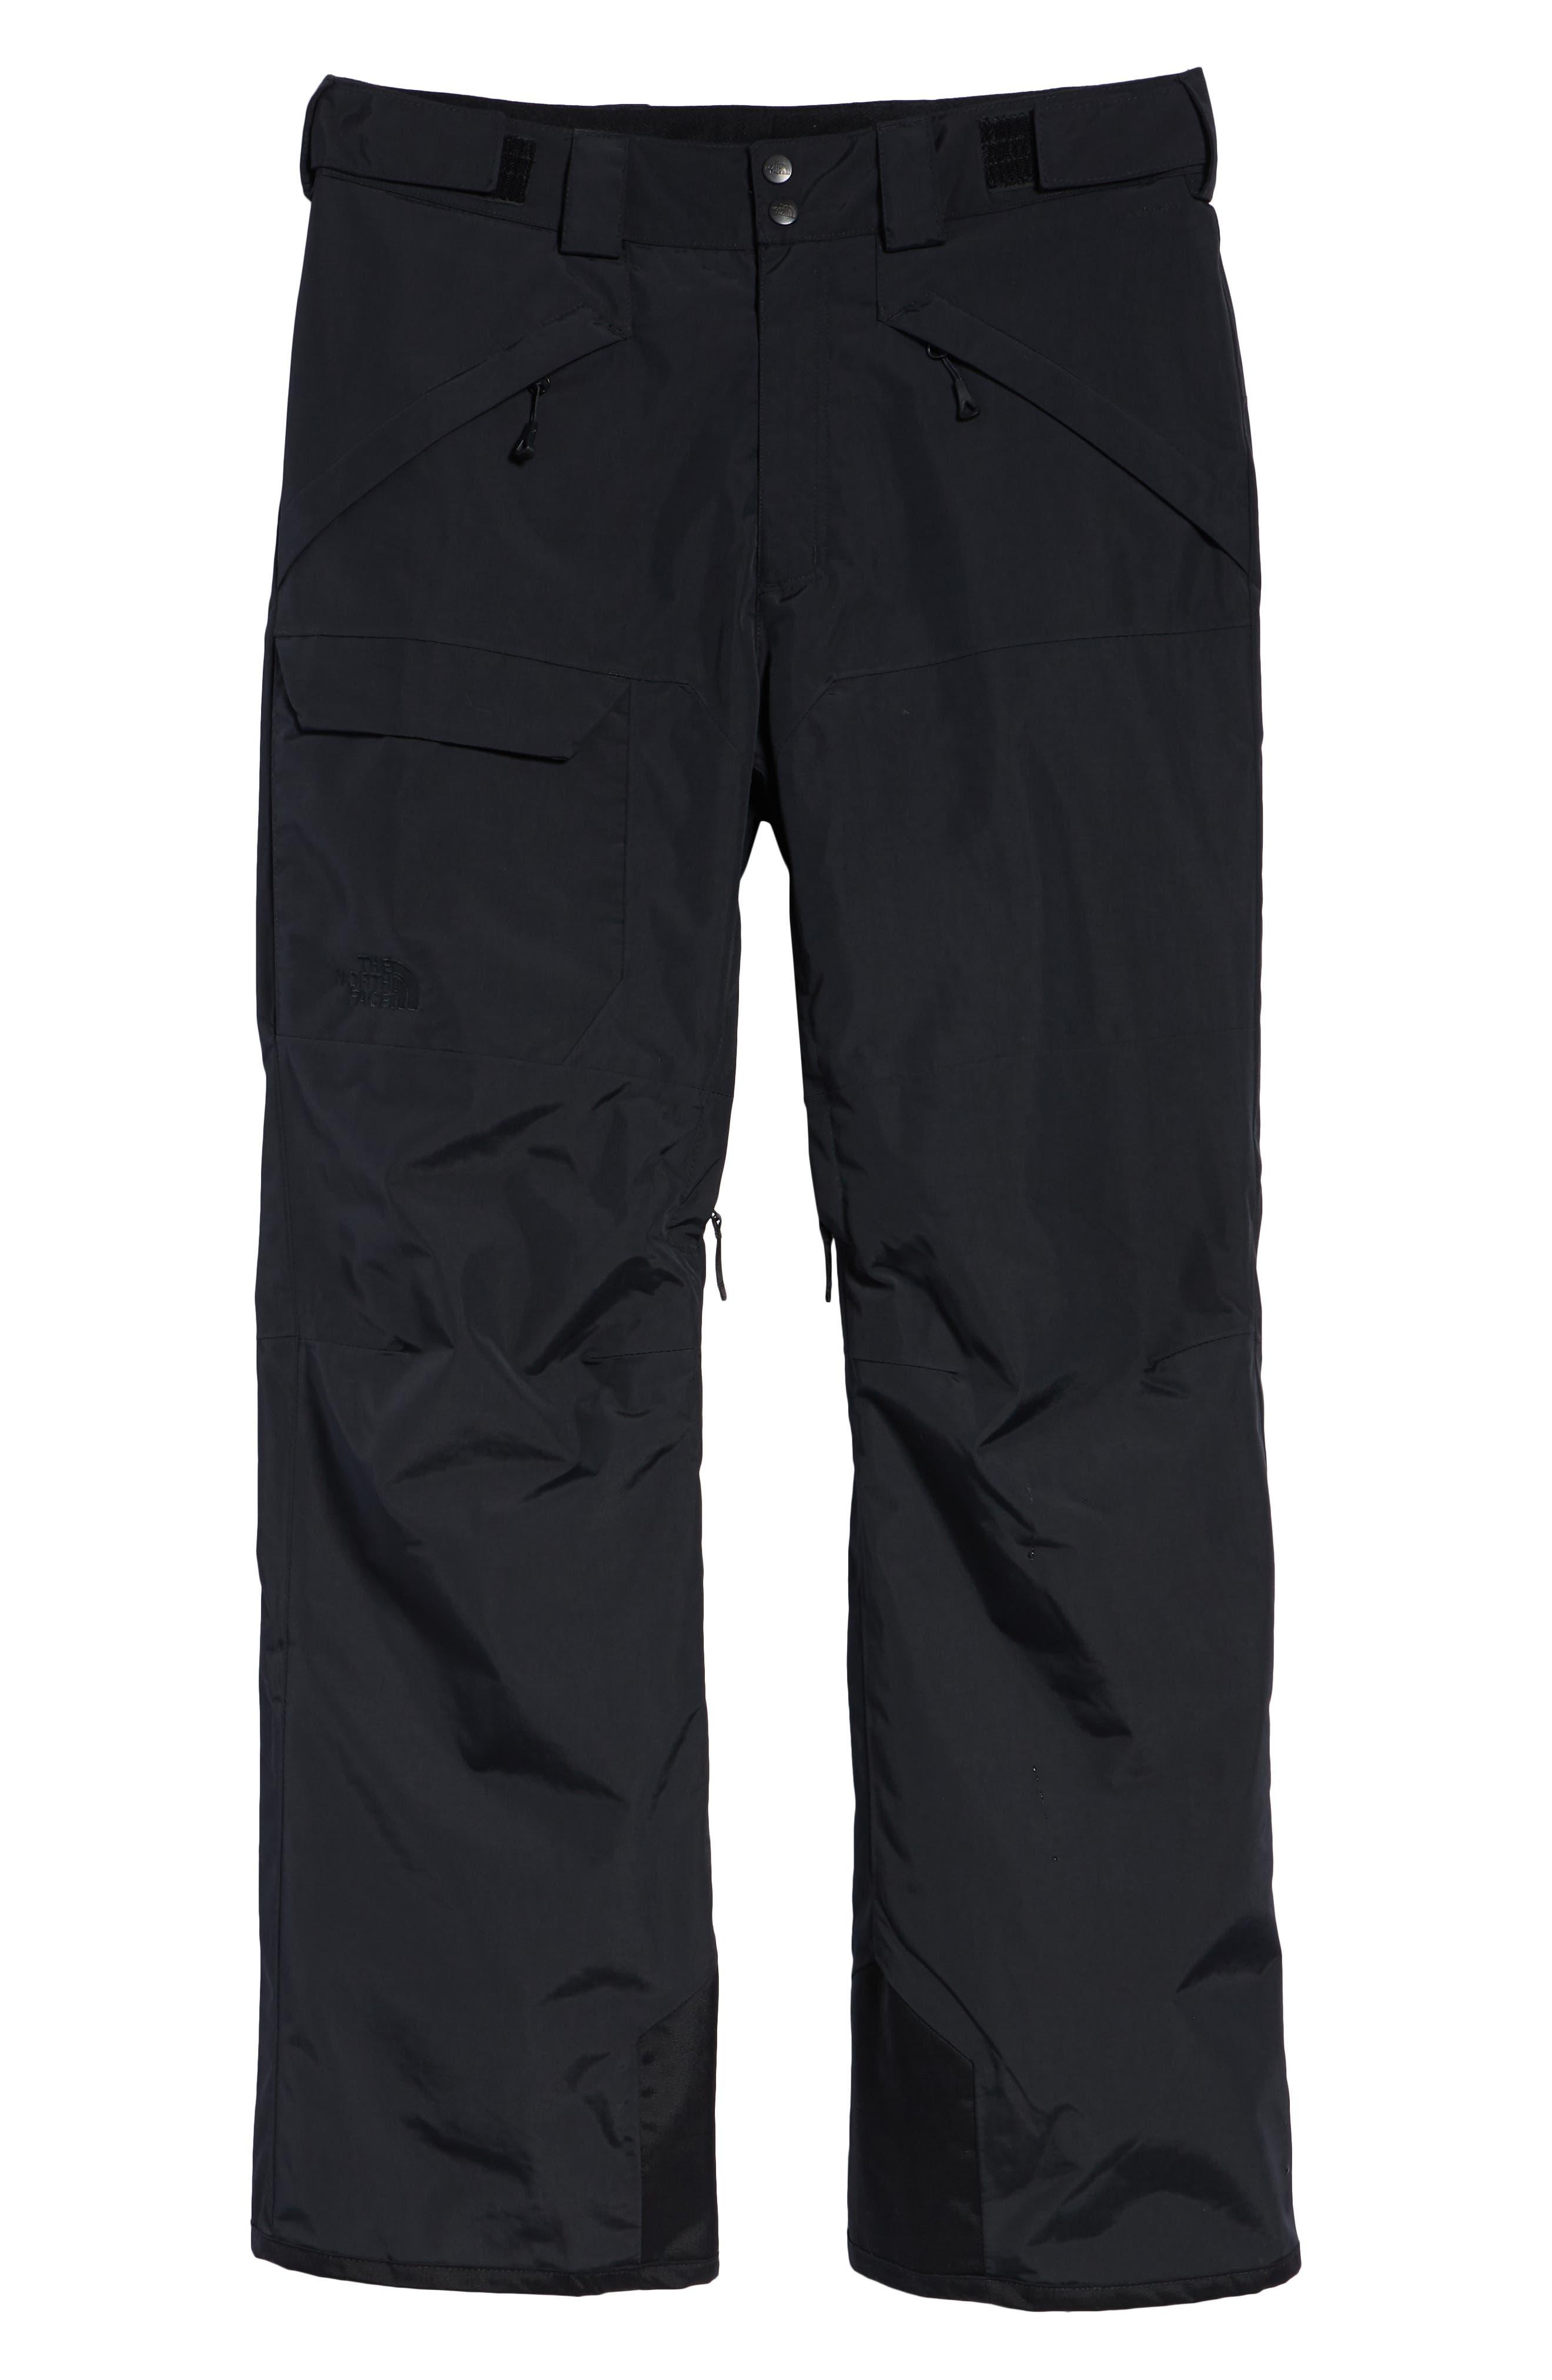 Freedom Heatseeker Insulated Snow Pants,                             Alternate thumbnail 6, color,                             TNF BLACK